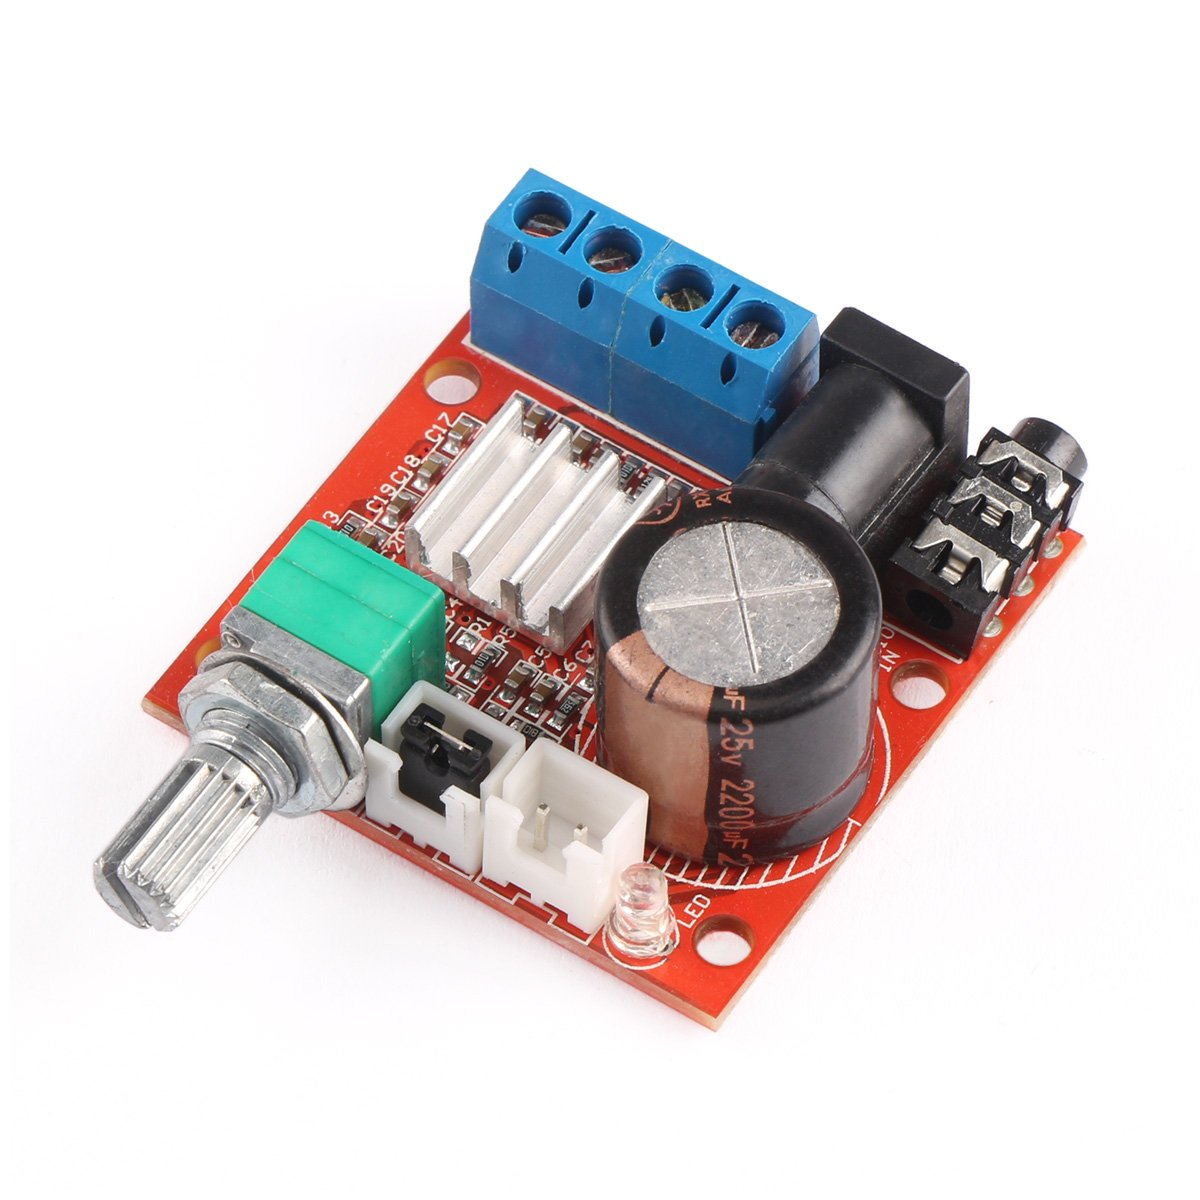 Cheap Class C Amplifier Circuit Find Power Get Quotations 12 Volt Board Drok Pam8610 Mini Stereo Amp 10w Digital Audio Amplify